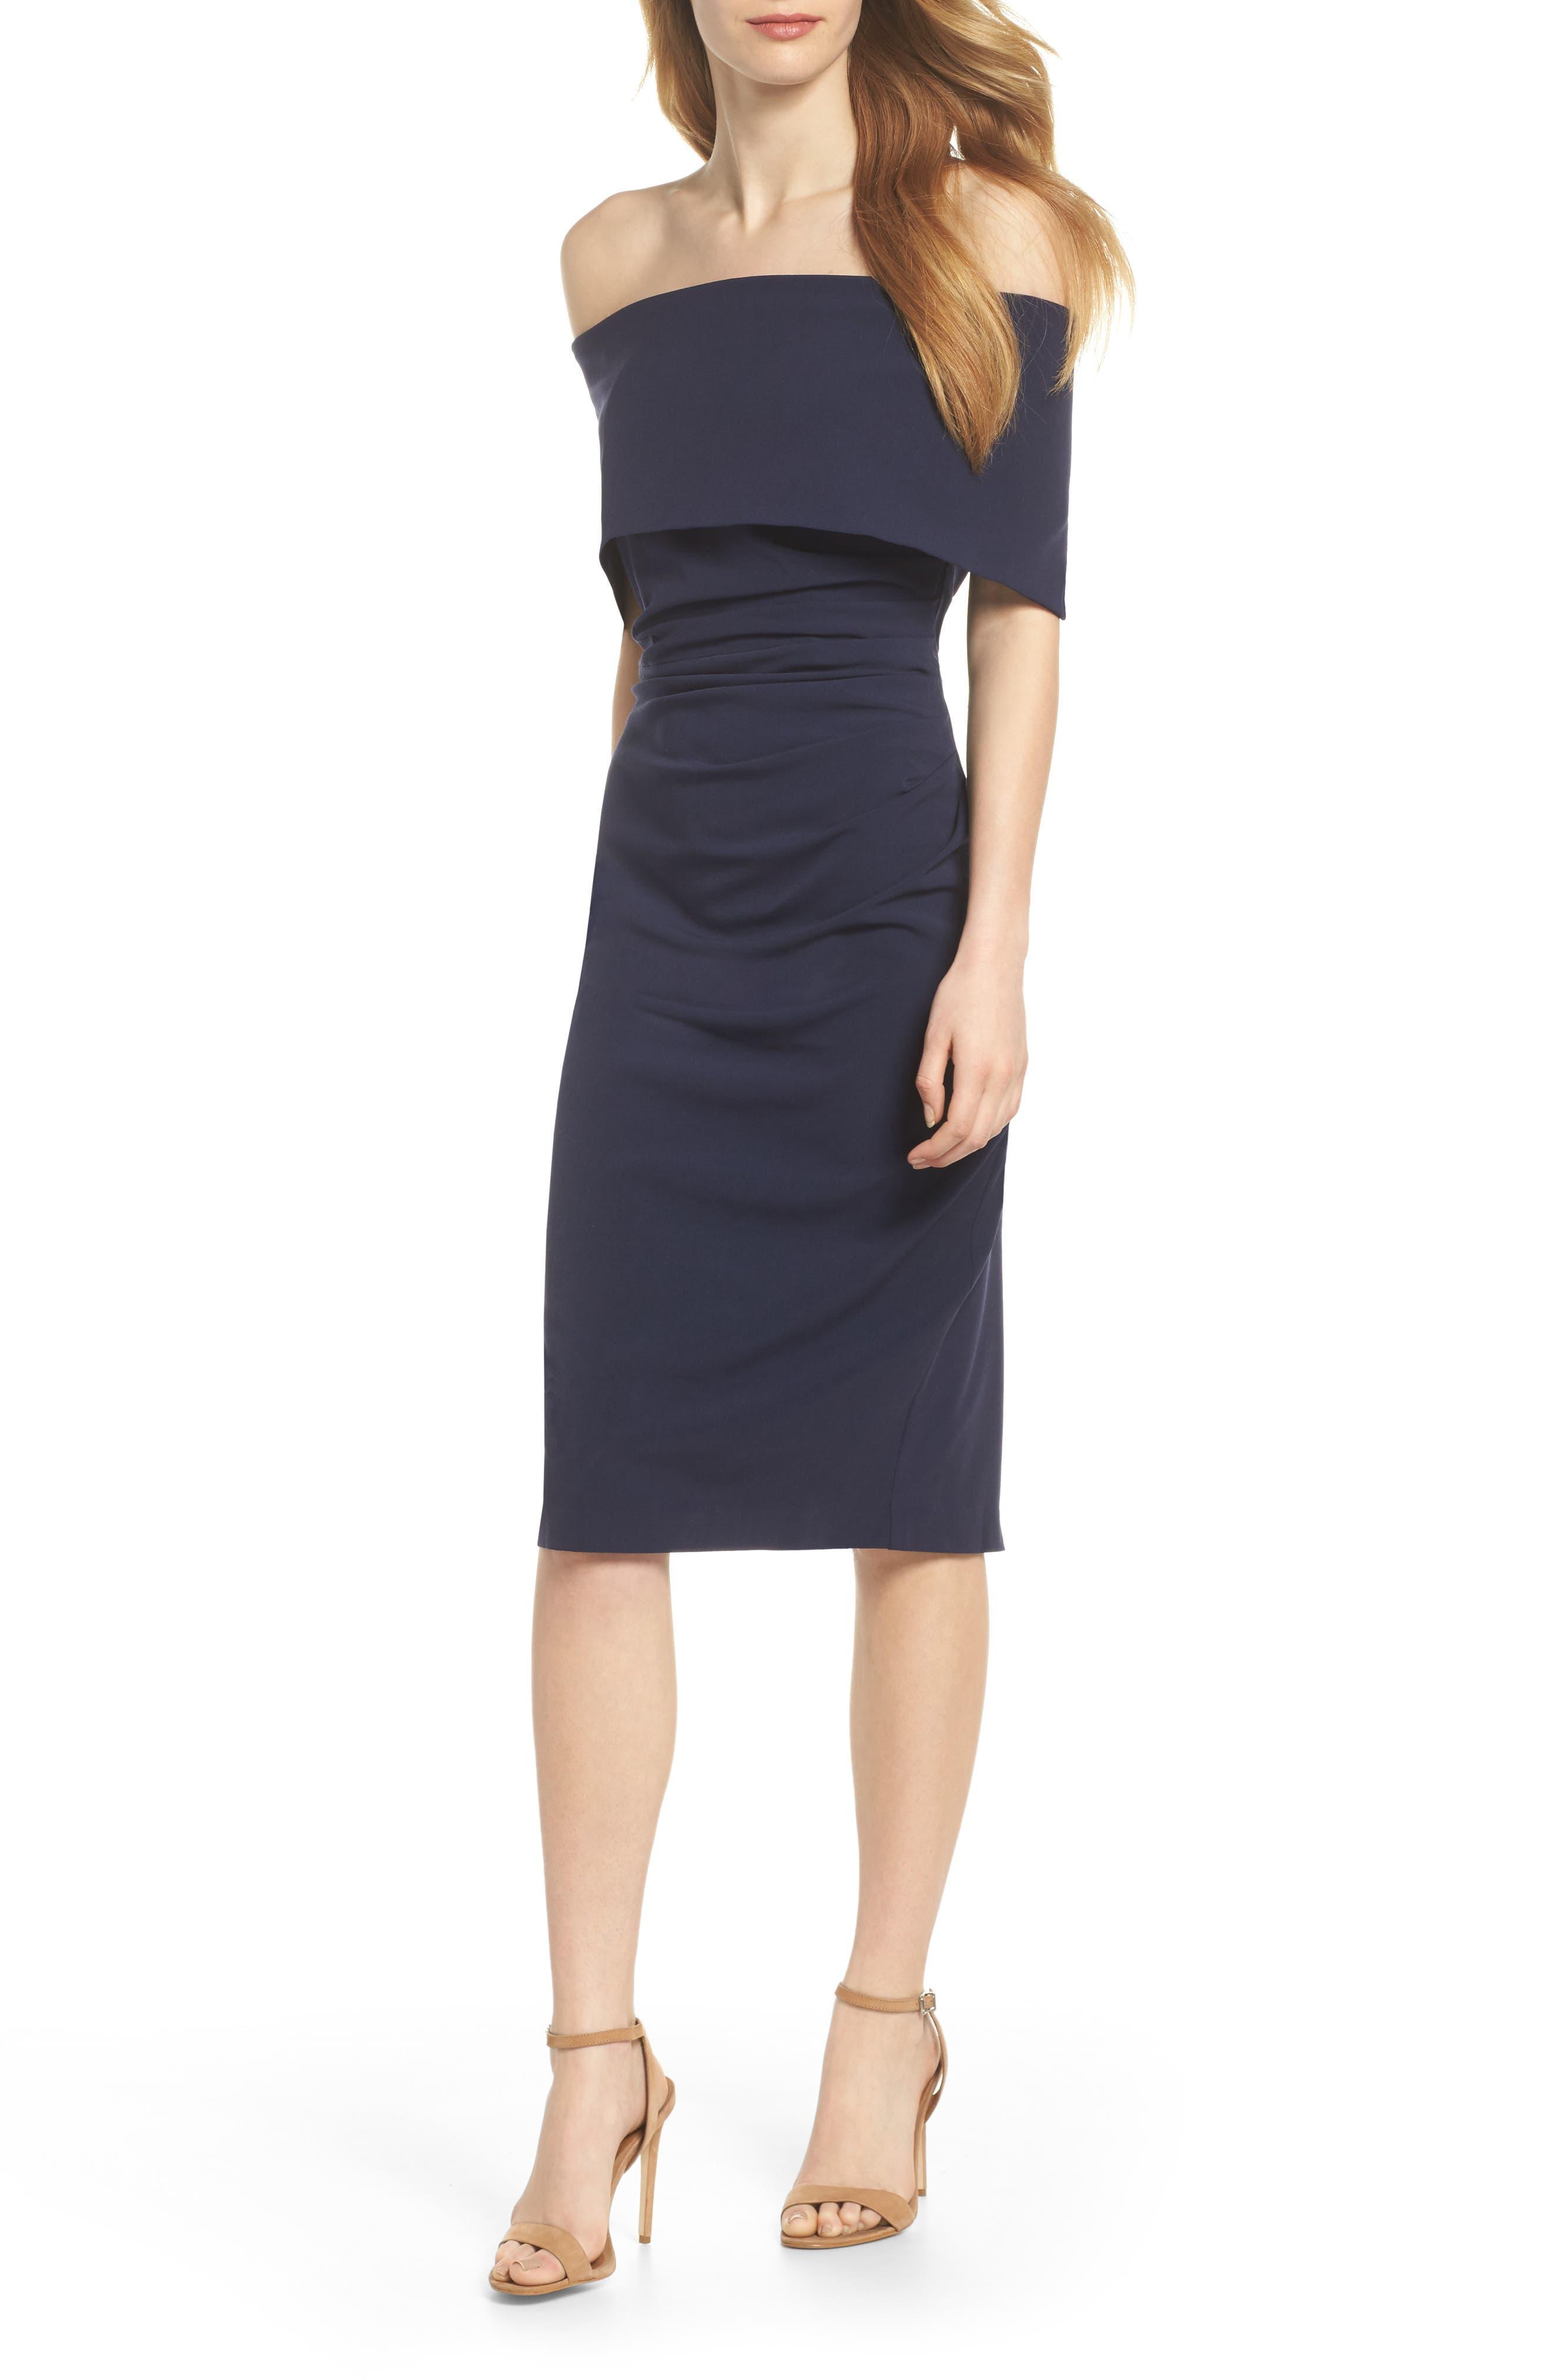 8b679ddbb4 Women's Vince Camuto Dresses | Nordstrom